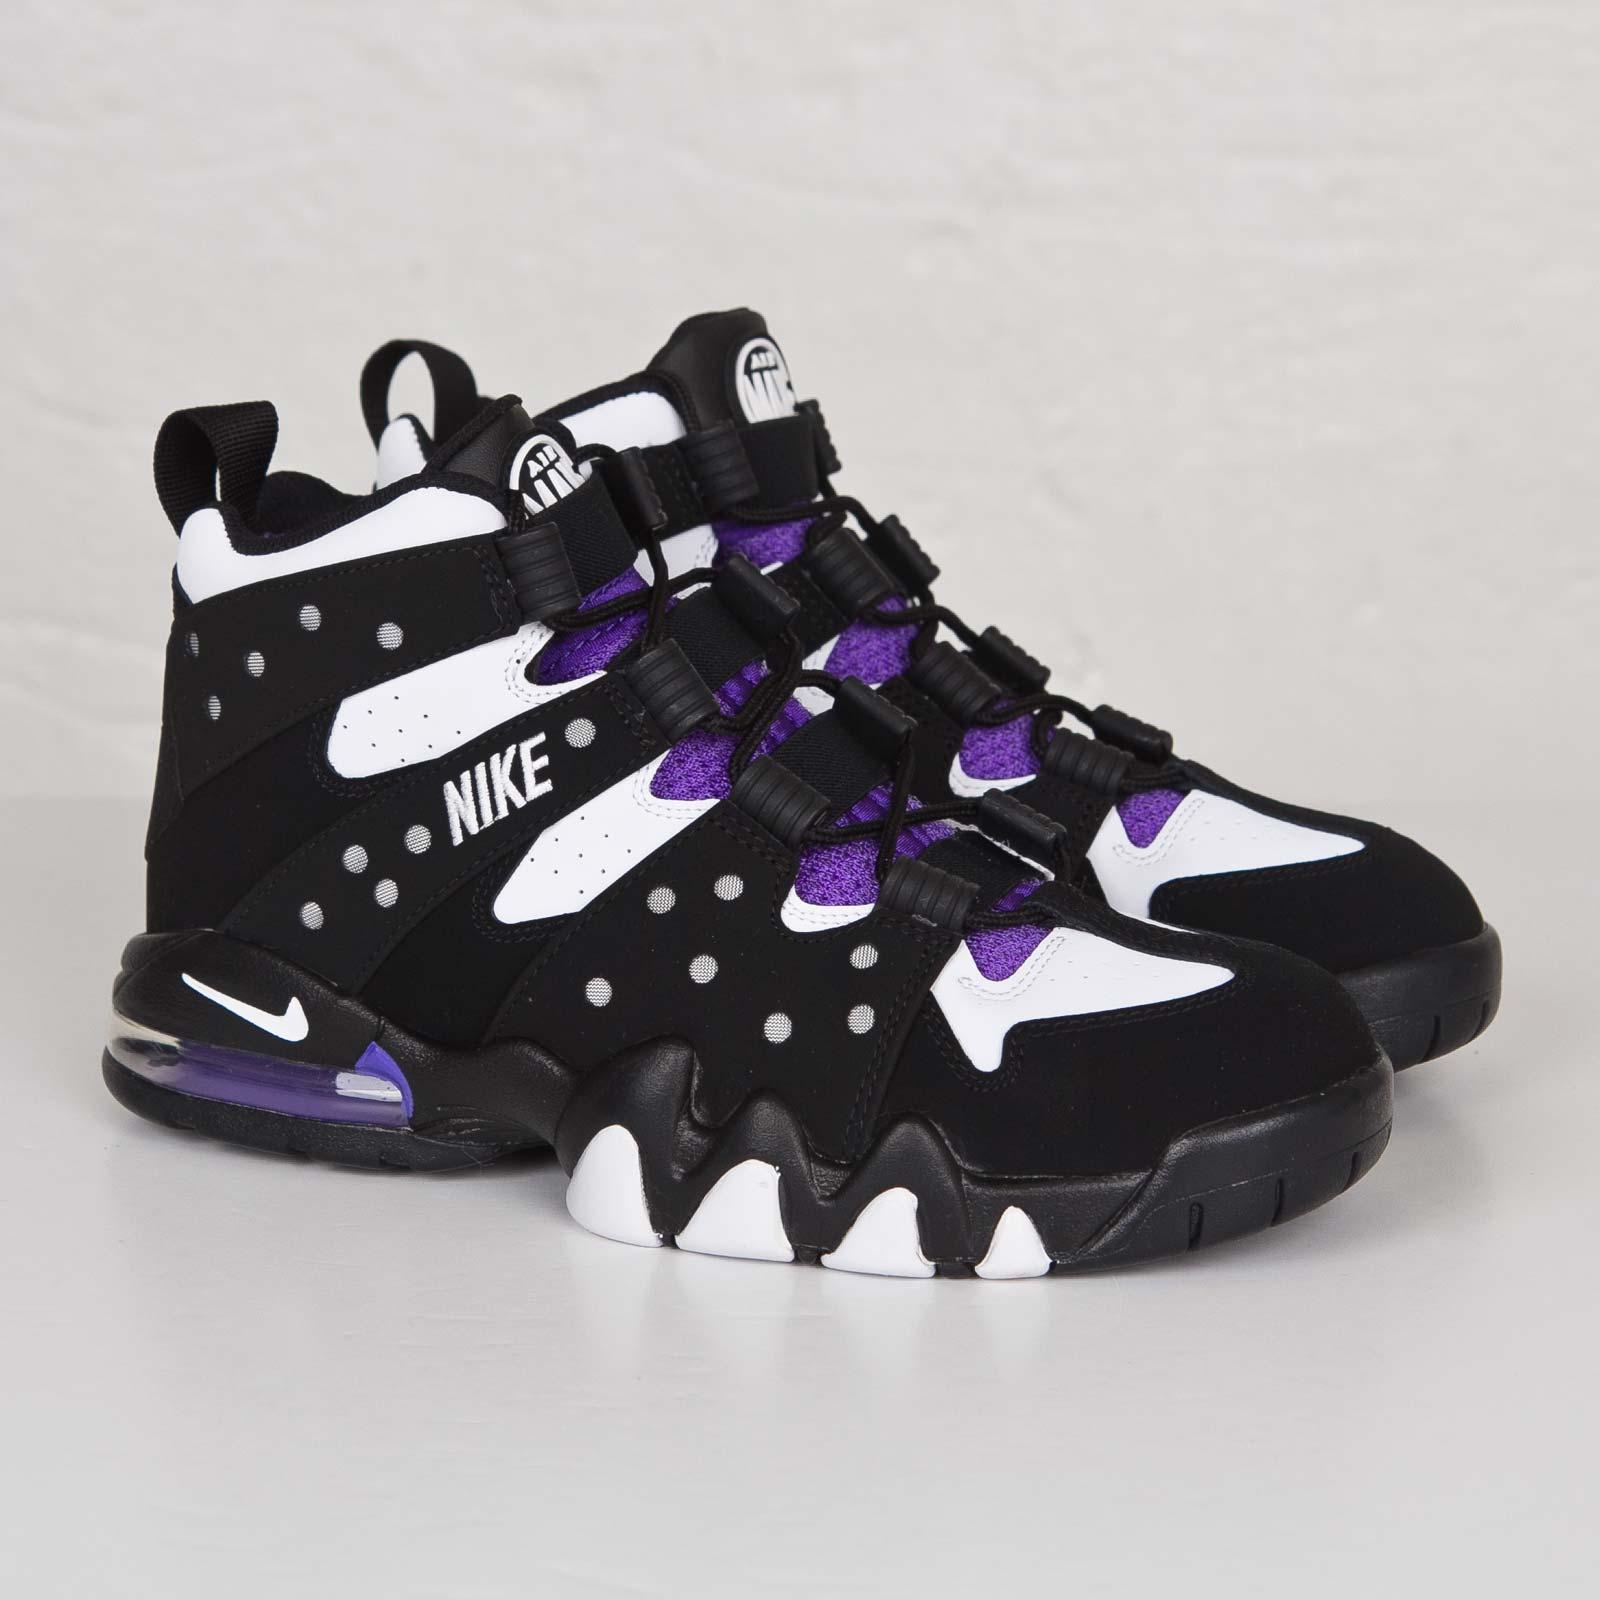 Nike Air Max2 CB 94 - 305440-006 - Sneakersnstuff   sneakers ...